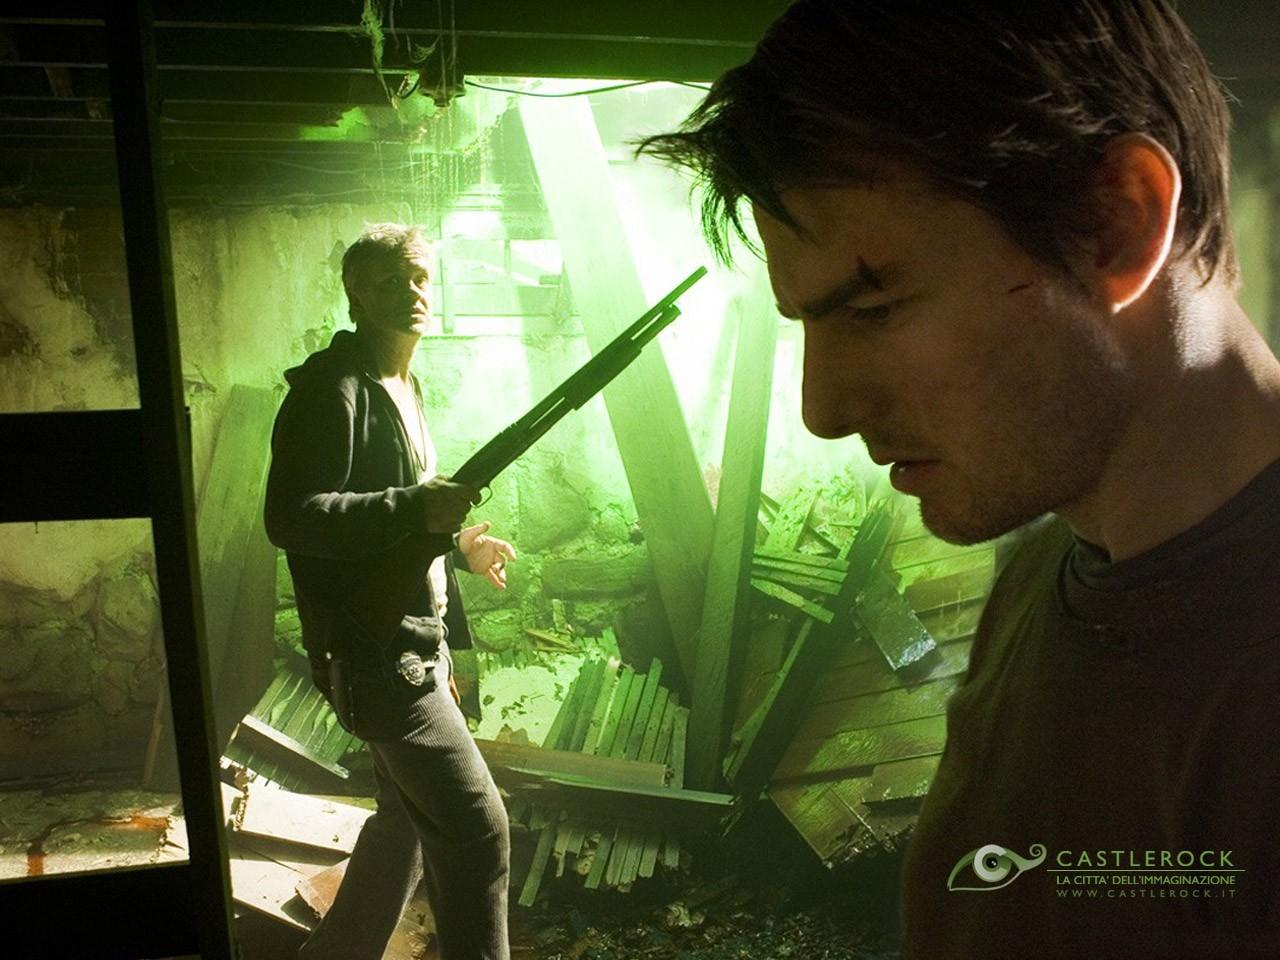 Wallpaper del film La guerra dei mondi (2005)